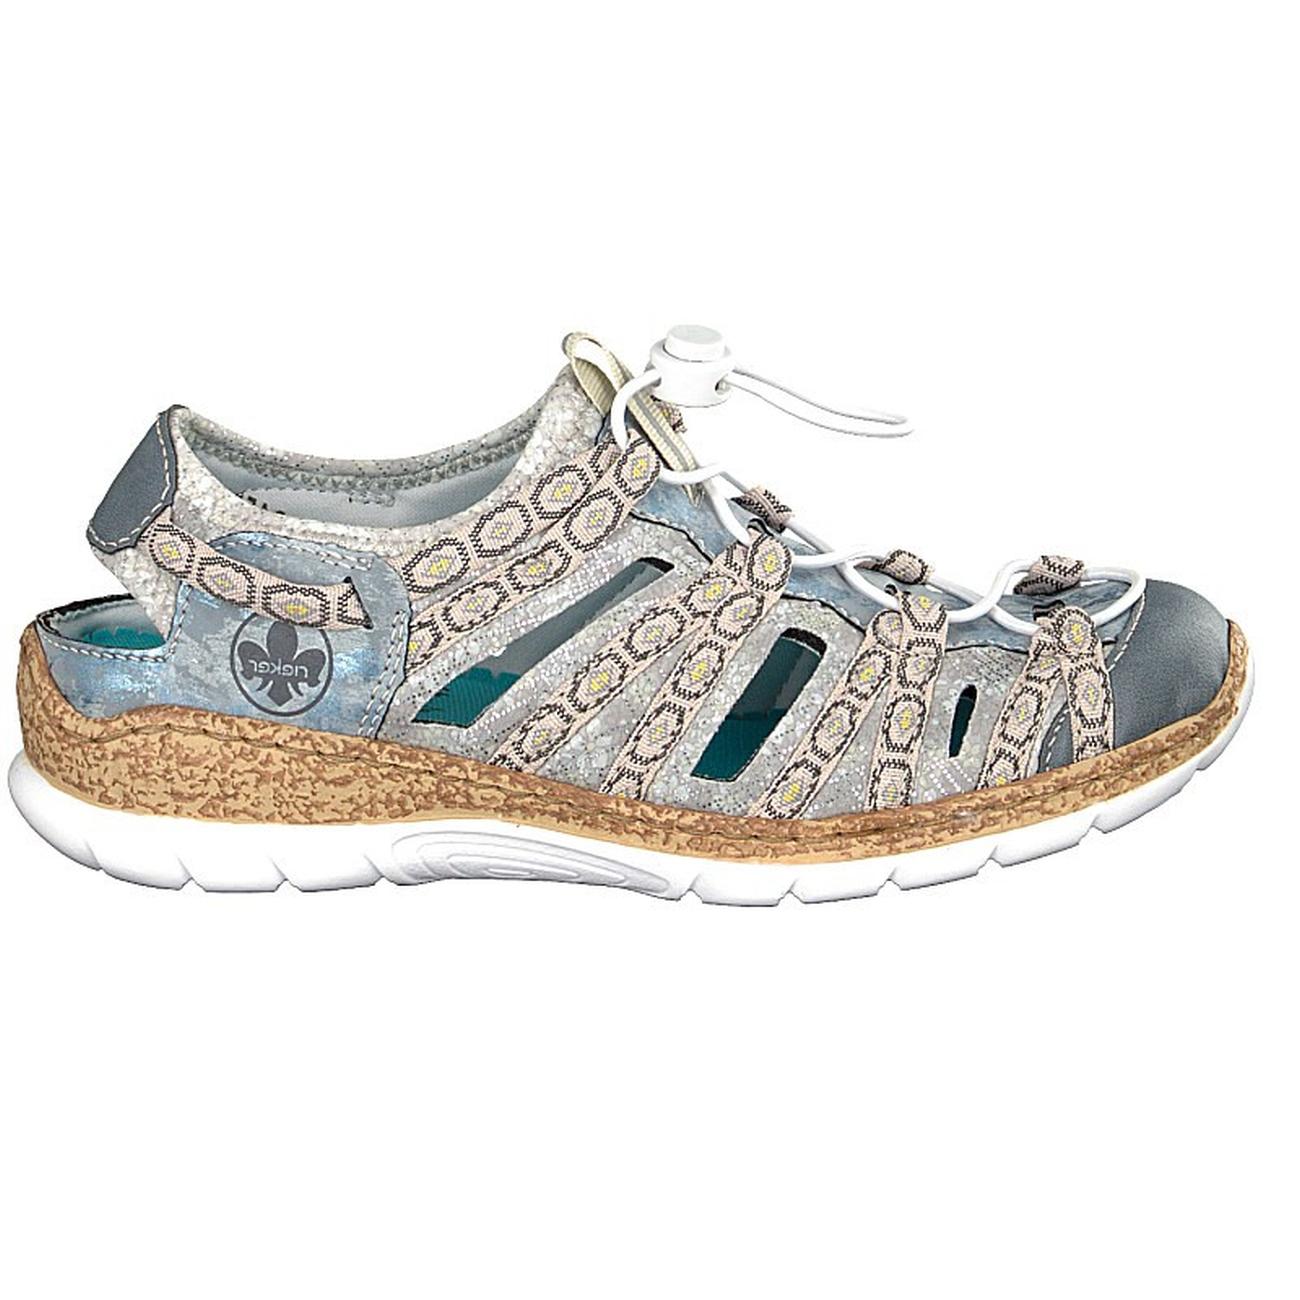 sports shoes cedb7 ad27b Rieker Damen Sneaker blau